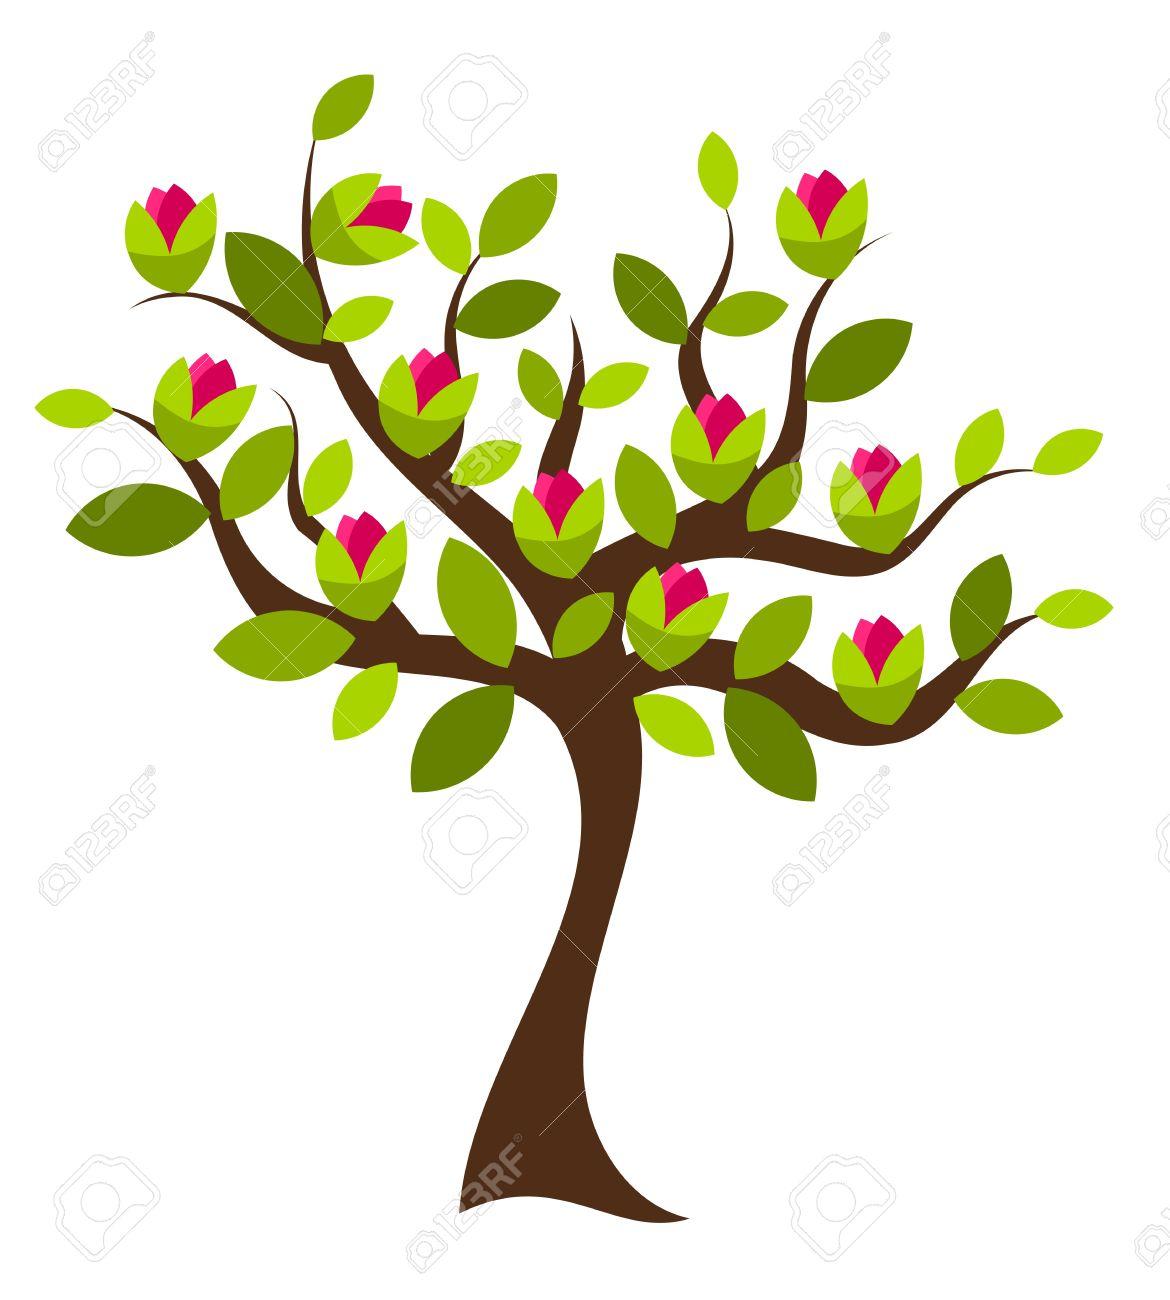 Beautiful Magnolia Tree With Big Pink Flowers. Vector Illustration.